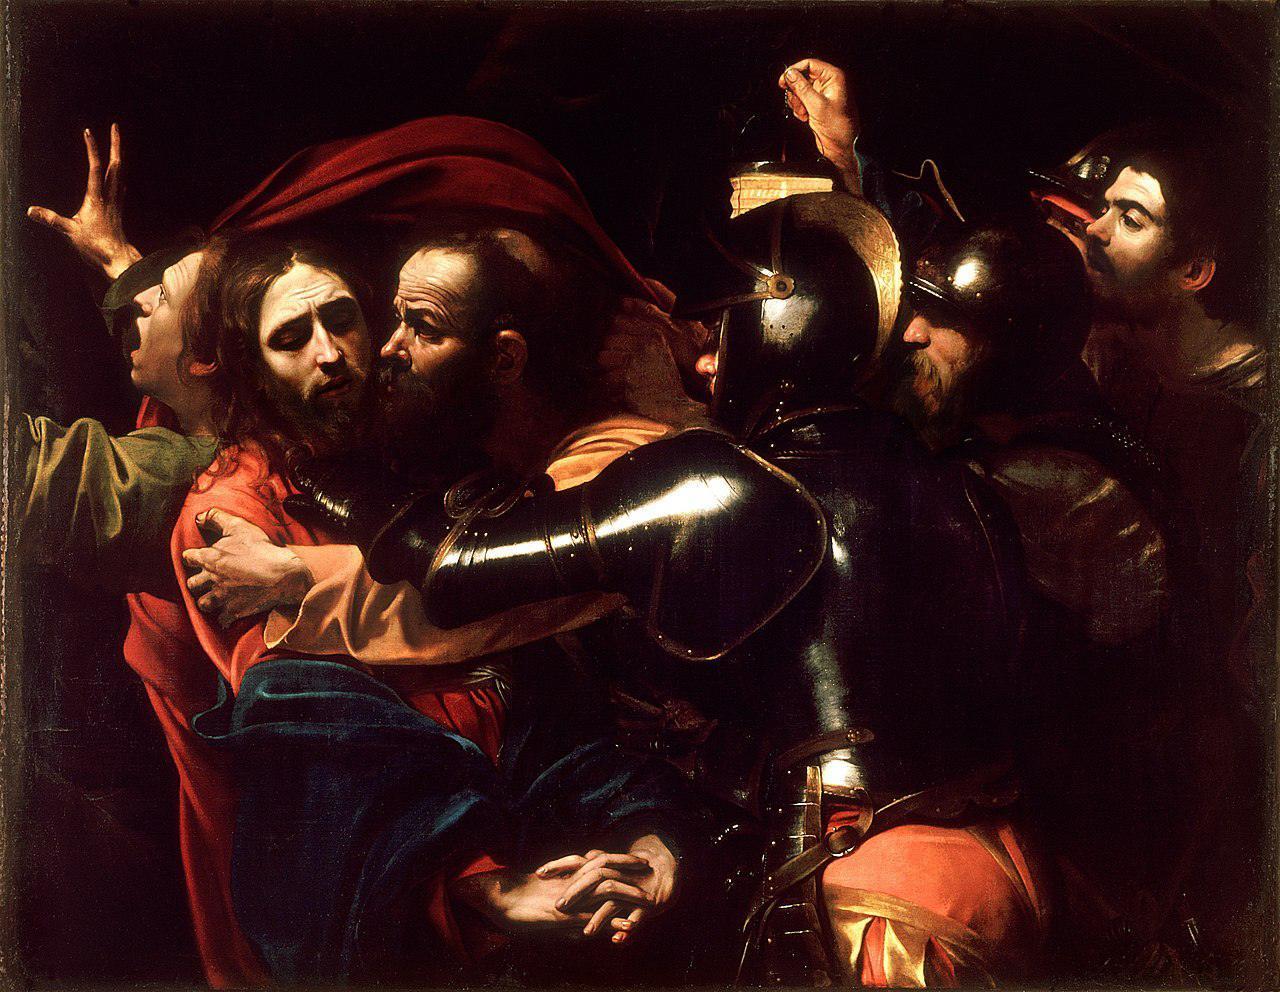 Judas betraying Jesus with a kiss